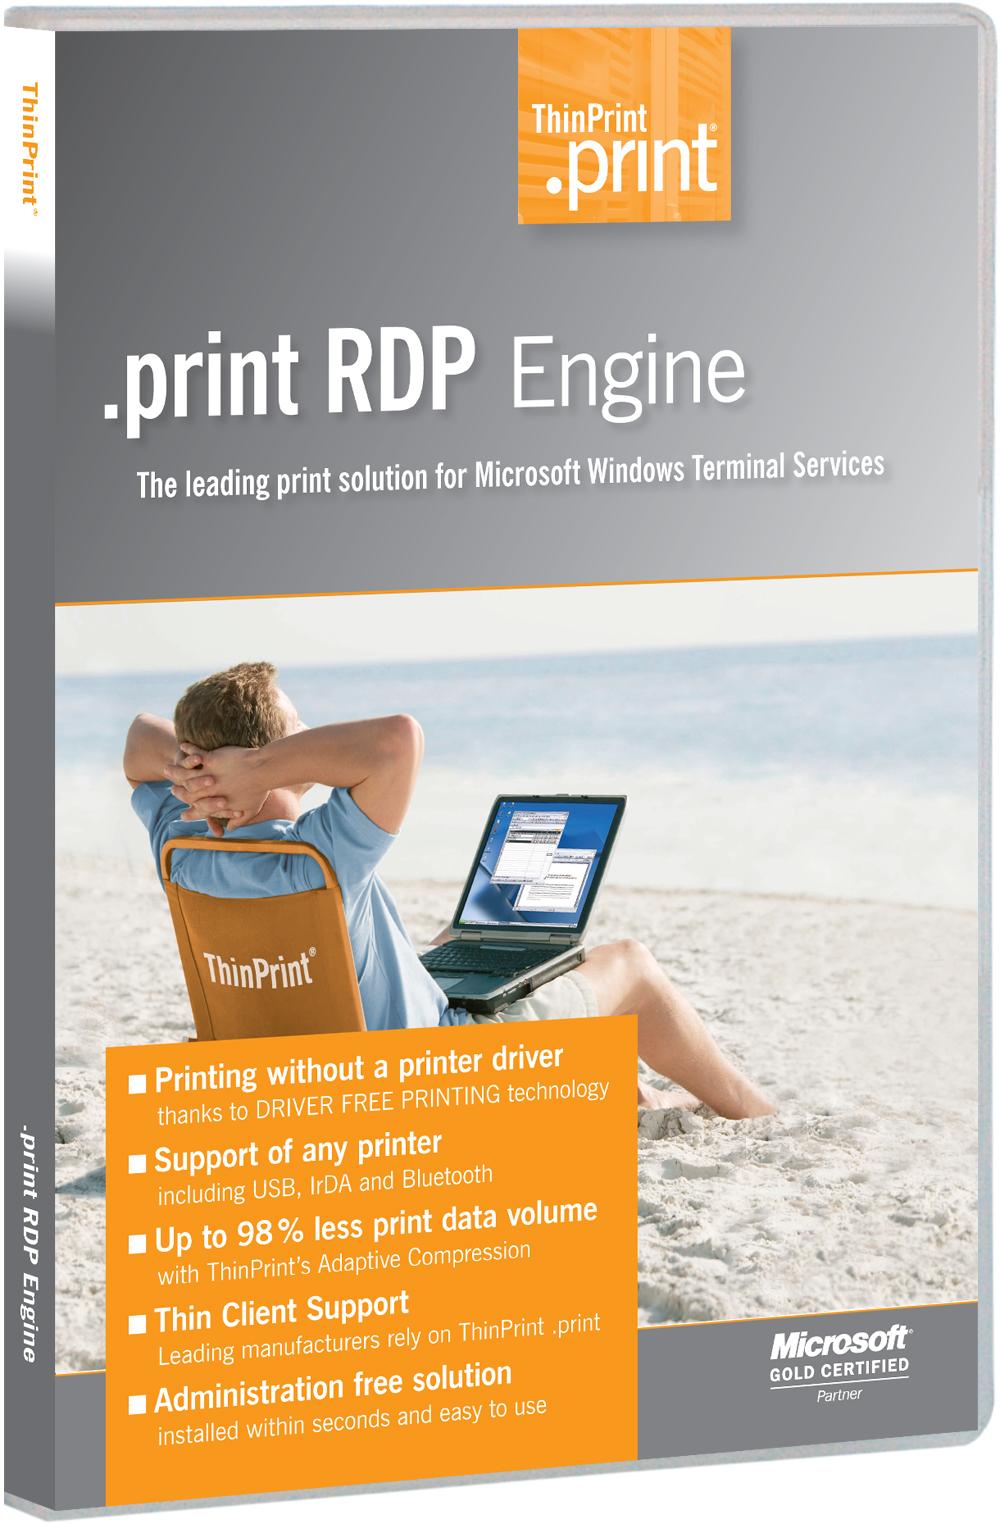 ThinPrint+.print+RDP+Engine.jpg